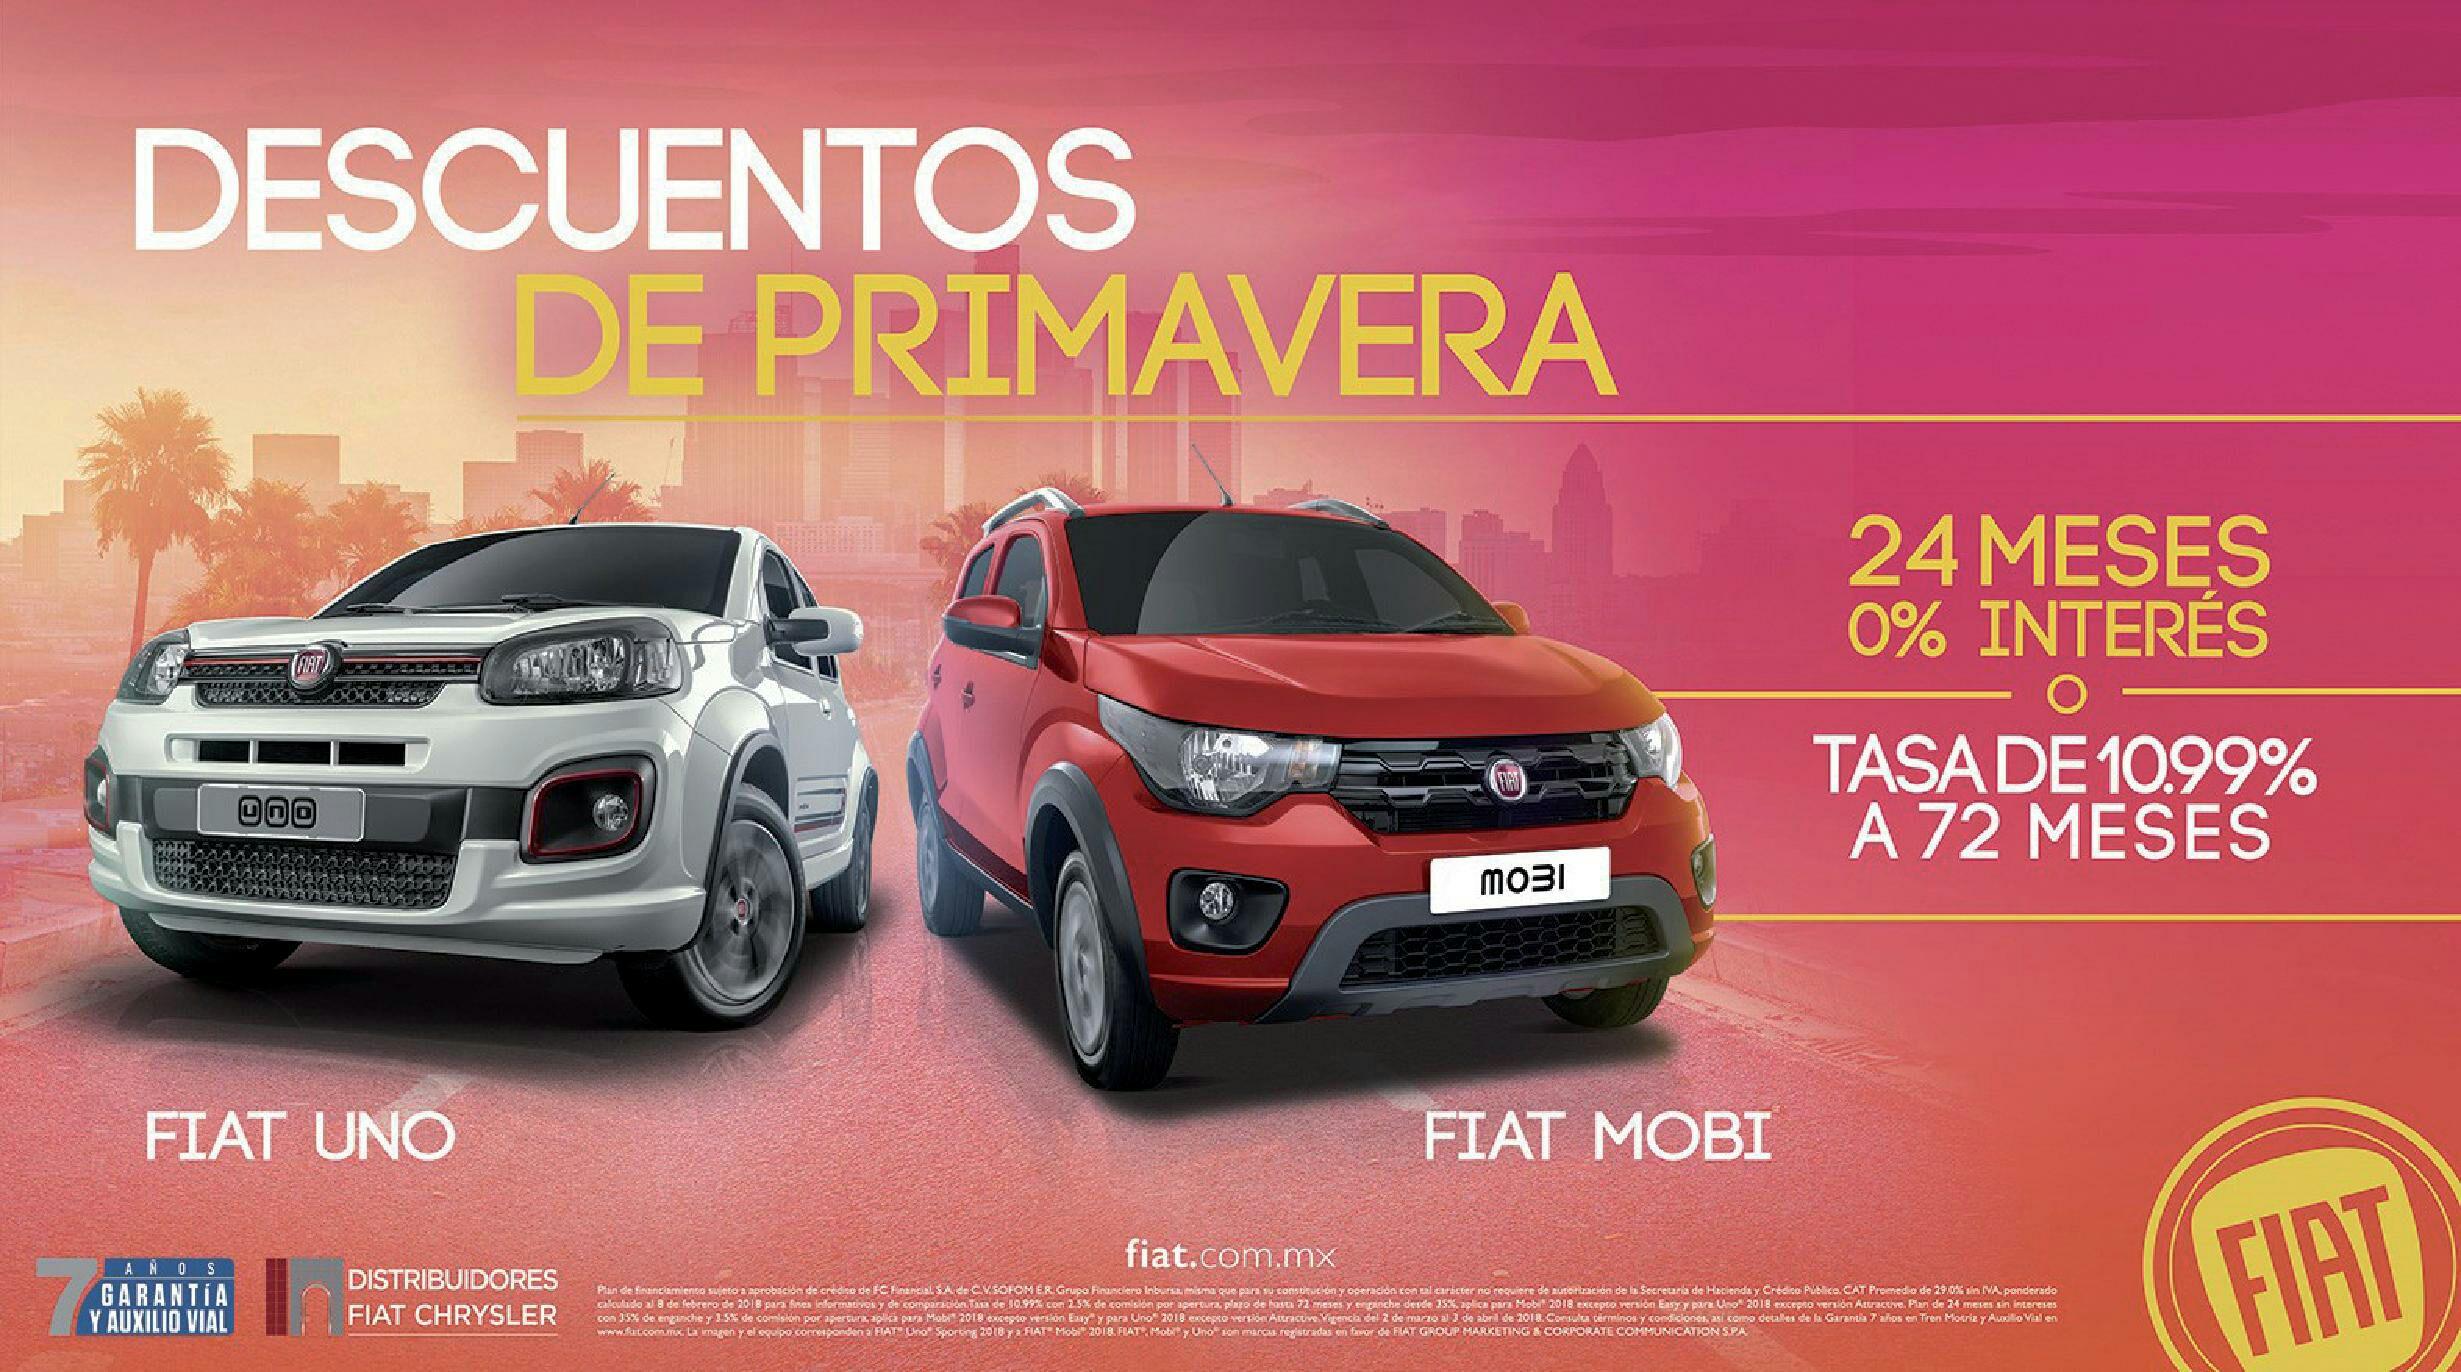 Fiat: Mobi enganche desde 10% o 24MSI